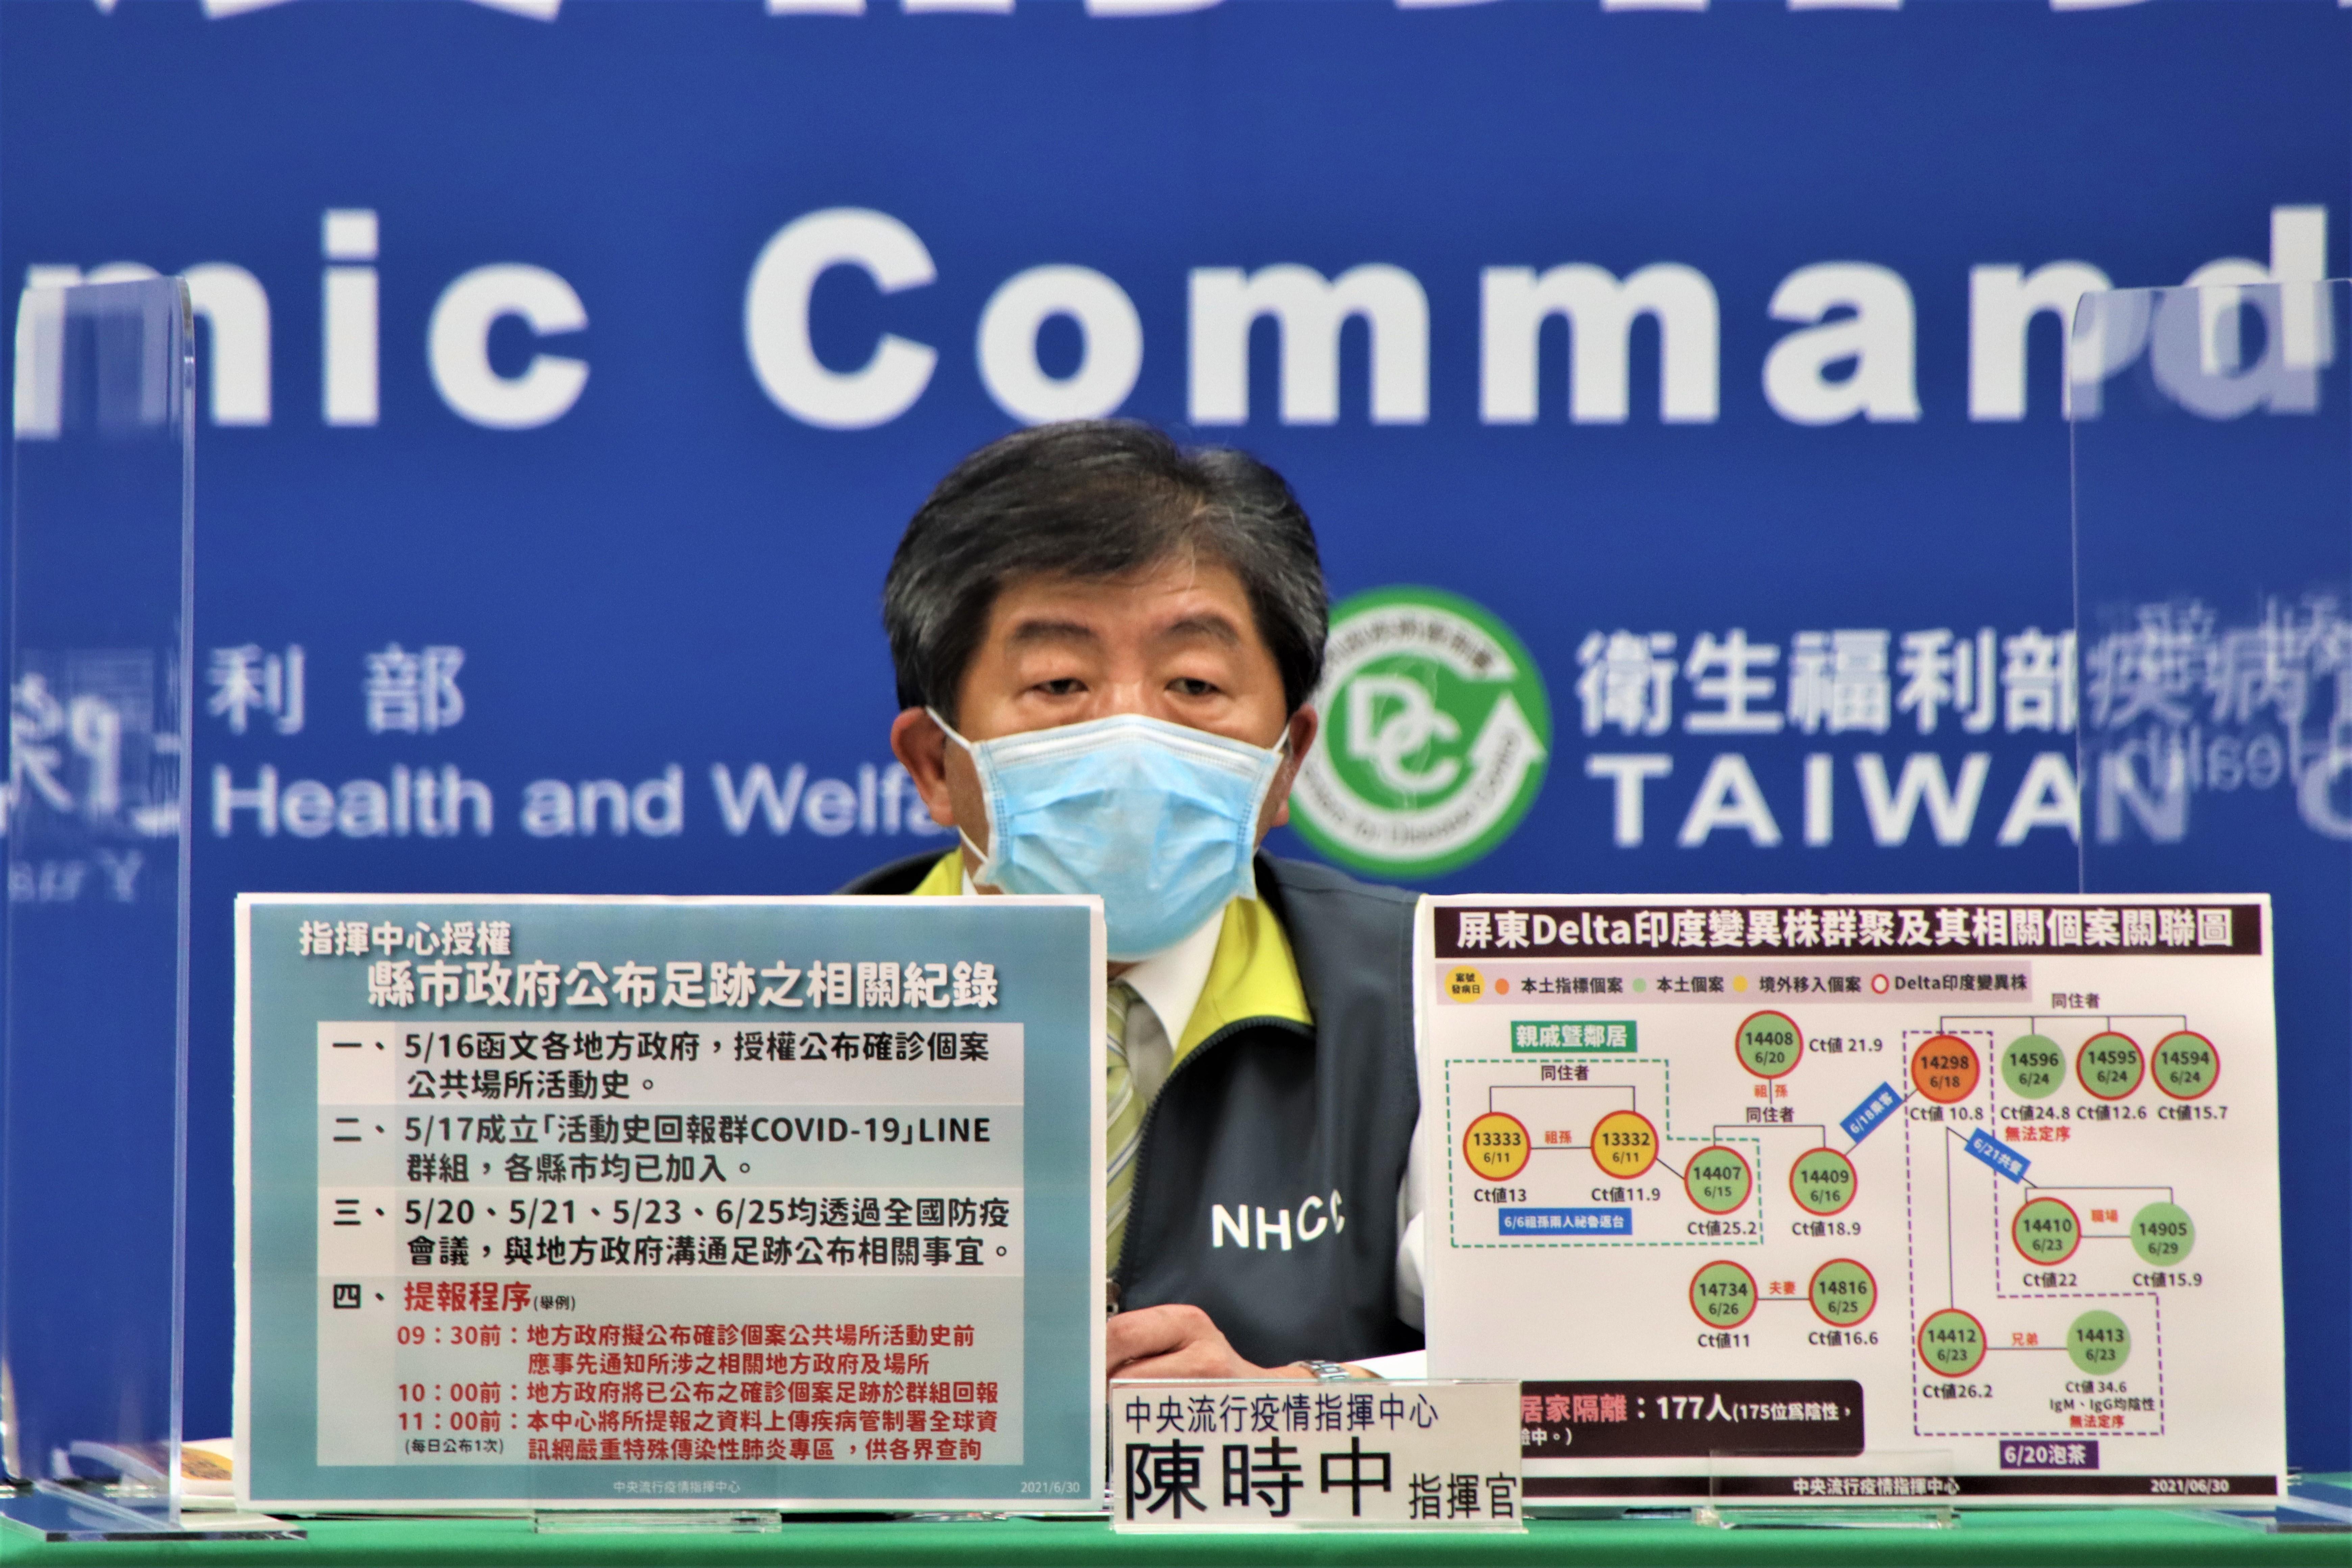 COVID-19,疫情,疫苗,民進黨,蔡英文,蘇貞昌,陳時中